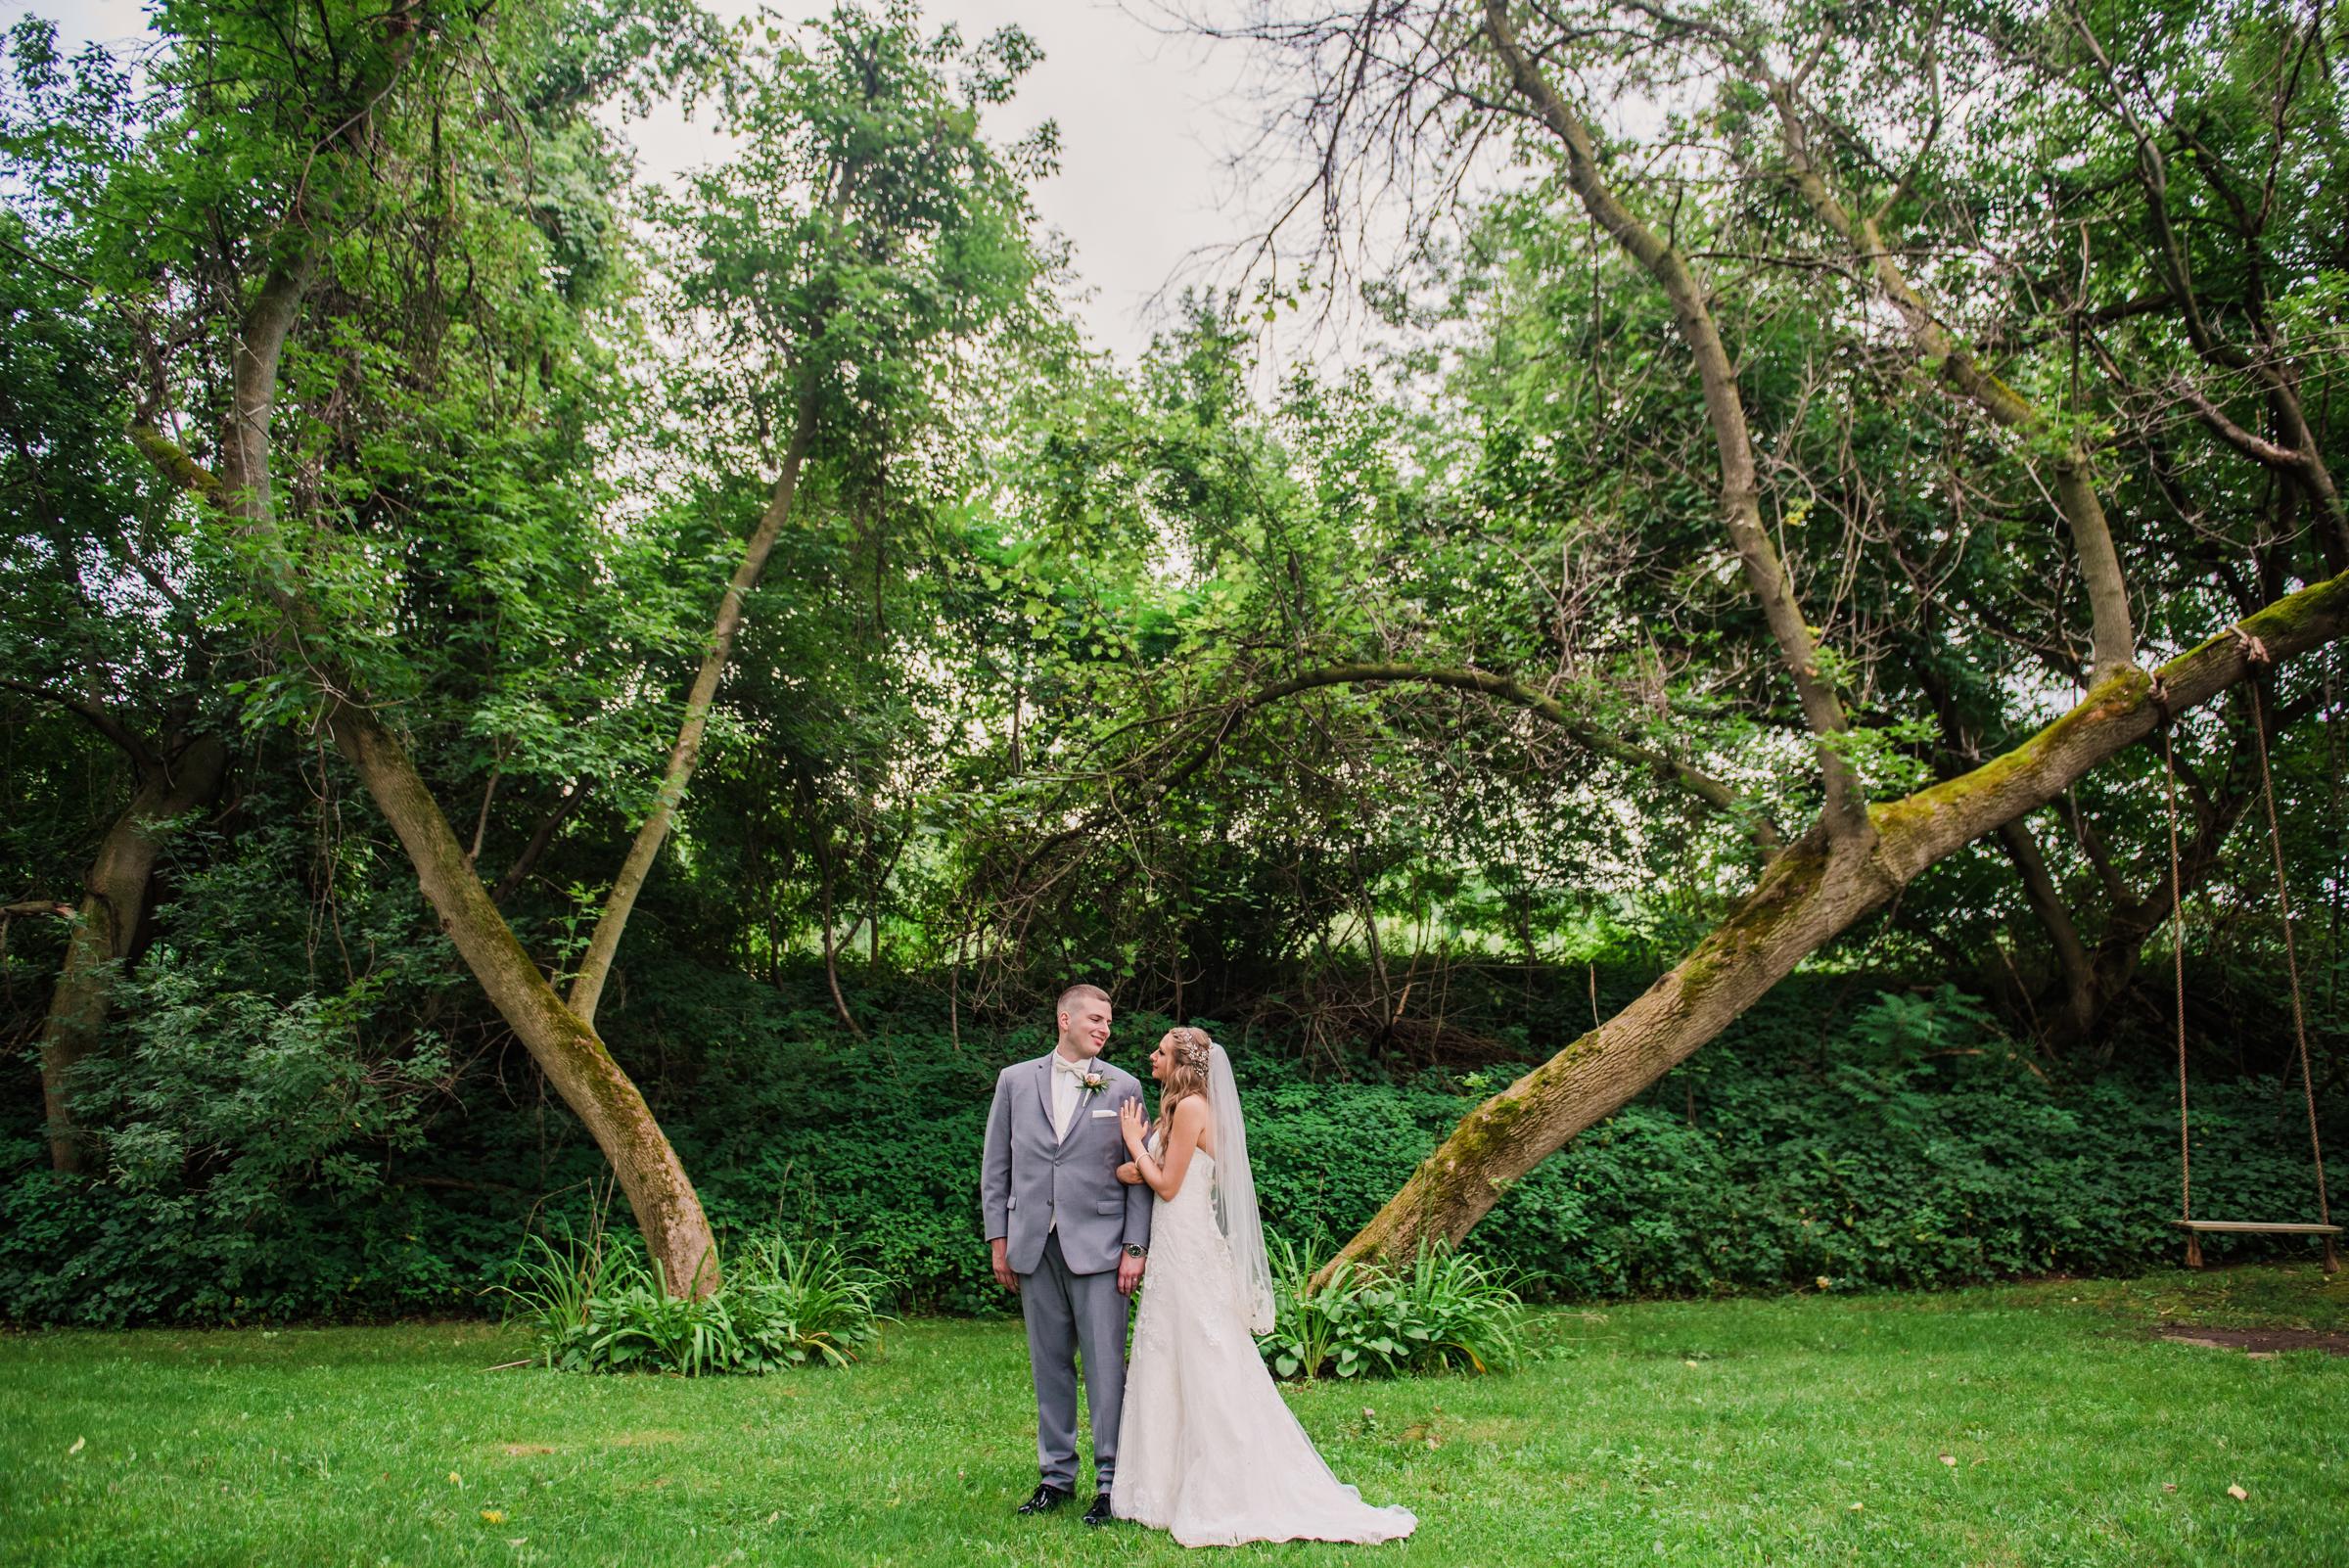 Wolf_Oak_Acres_Central_NY_Wedding_JILL_STUDIO_Rochester_NY_Photographer_DSC_8773.jpg